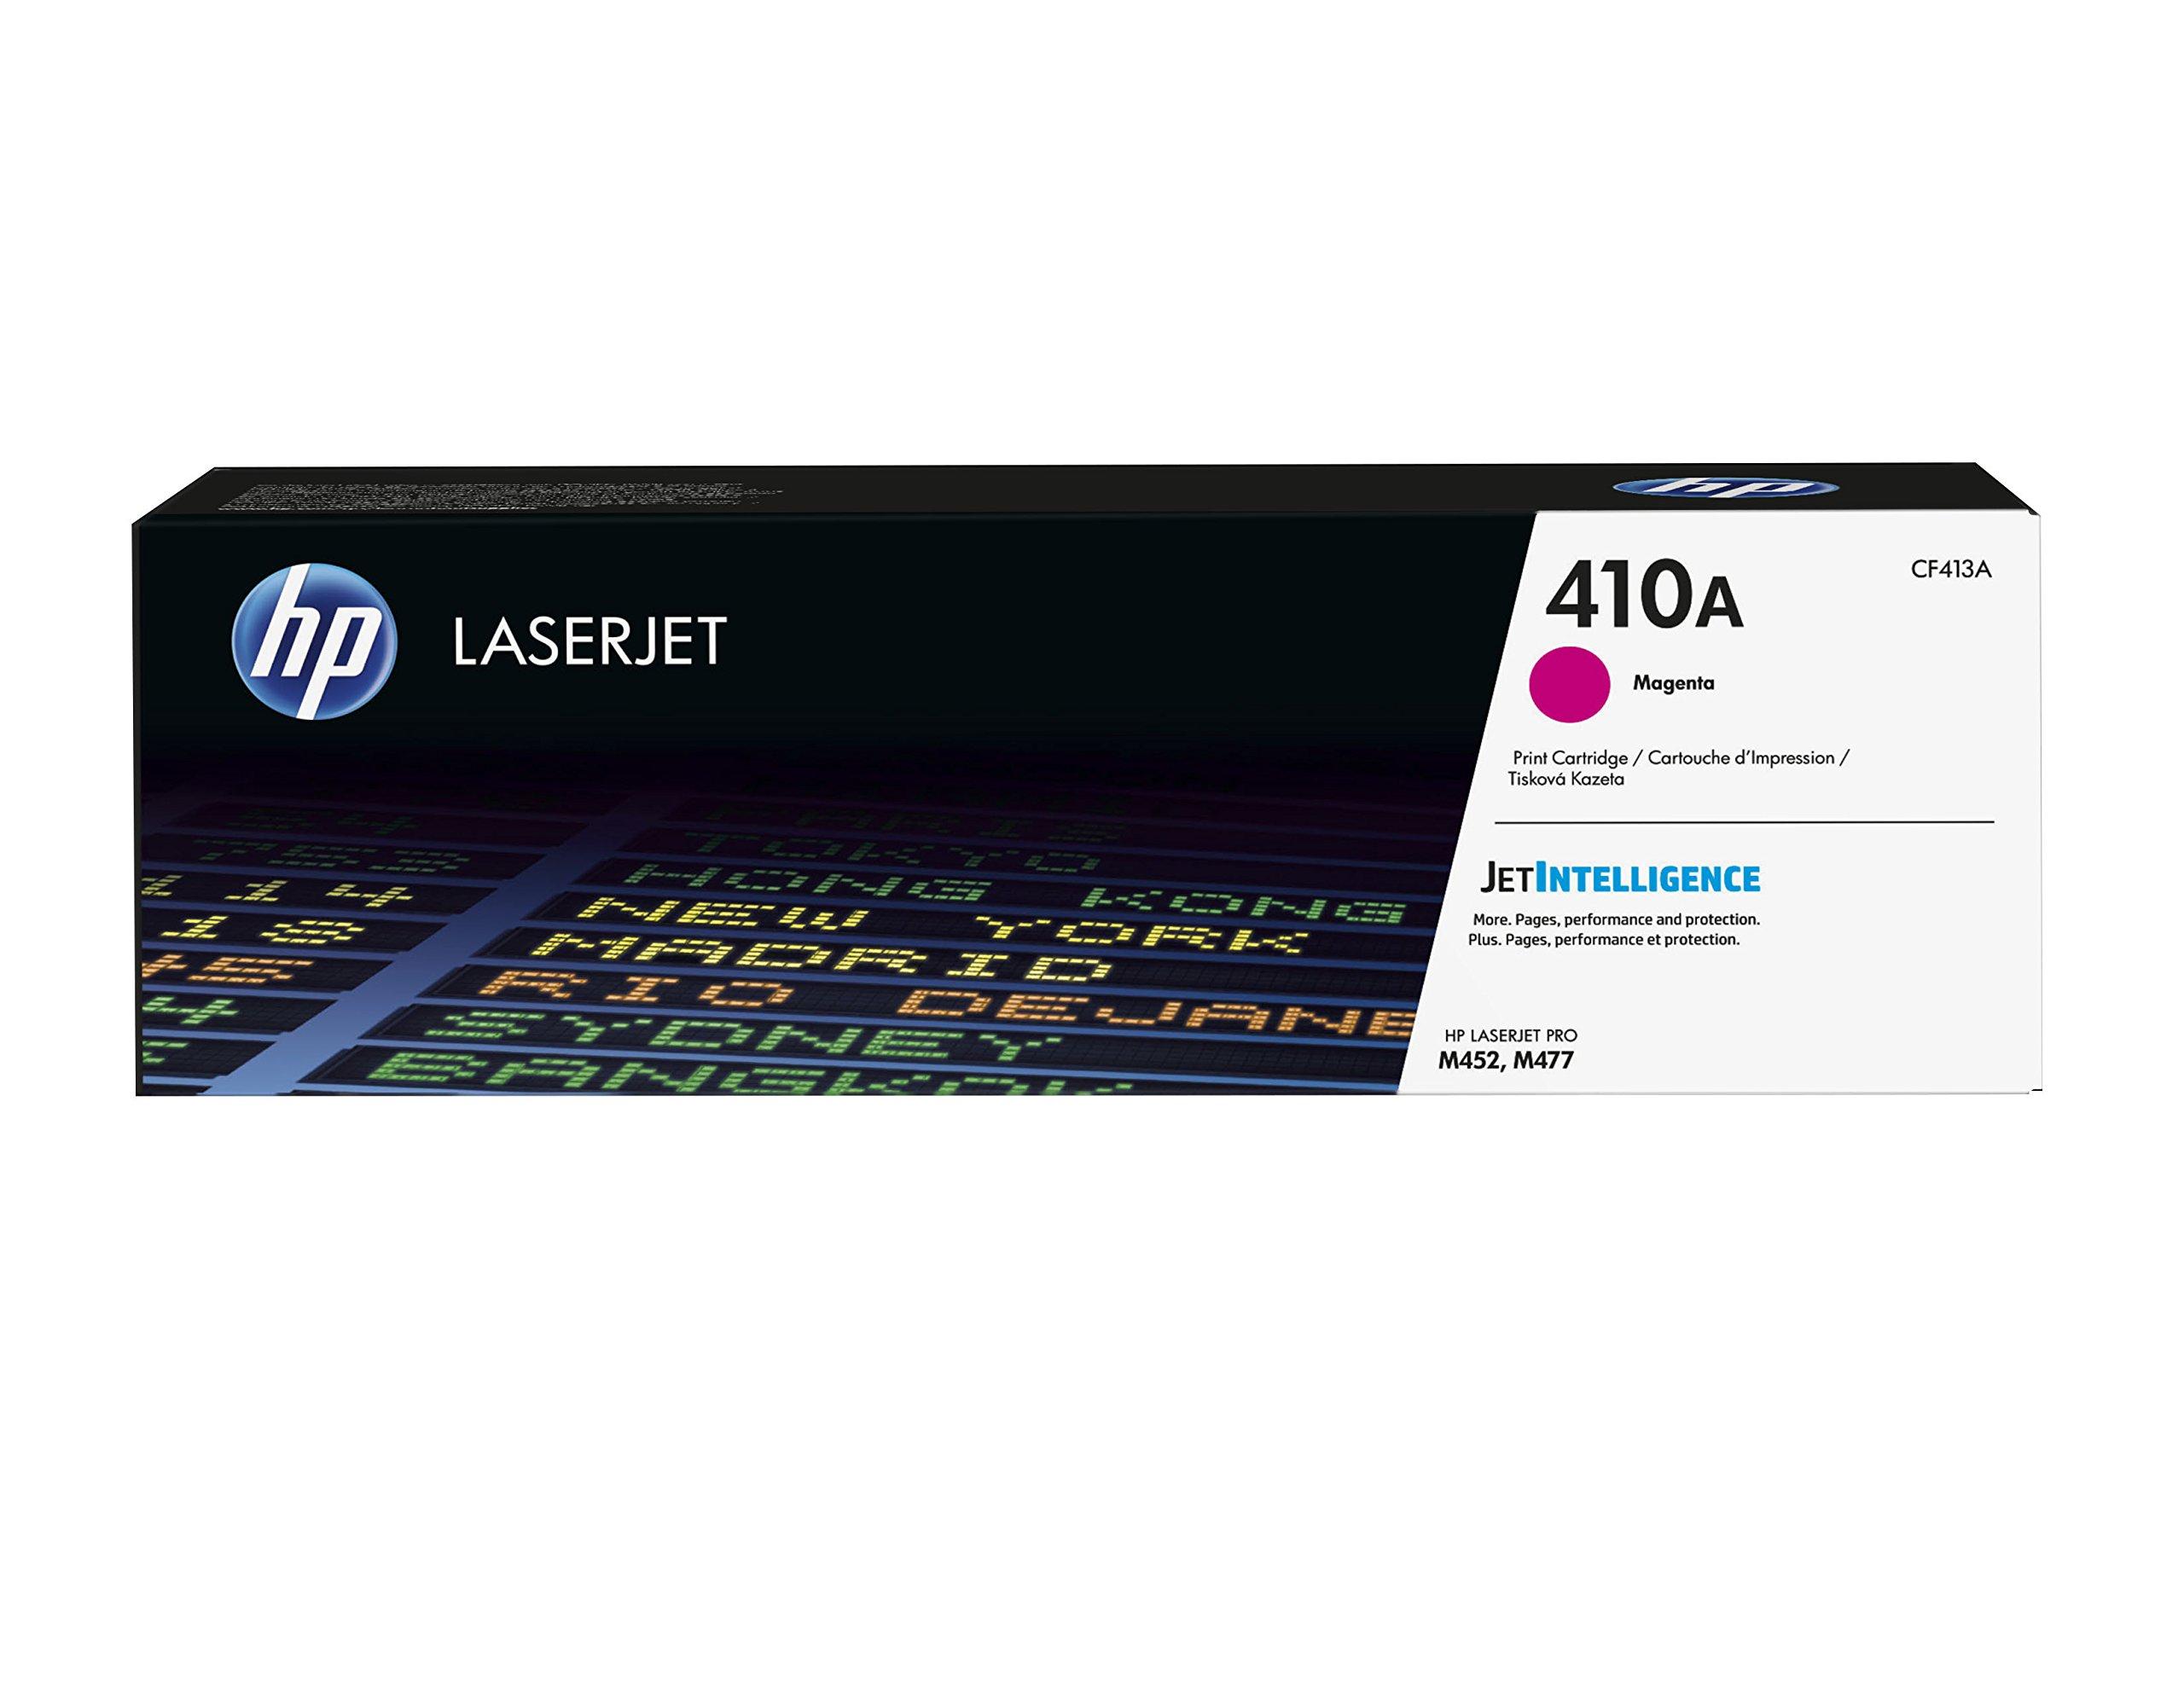 HP 410A (CF413A) Toner Cartridge, Magenta for HP Color LaserJet Pro M452dn, M452dw, M452nw, MFP M377dw, MFP M477fdn, MFP M477fdw, MFP M477fnw